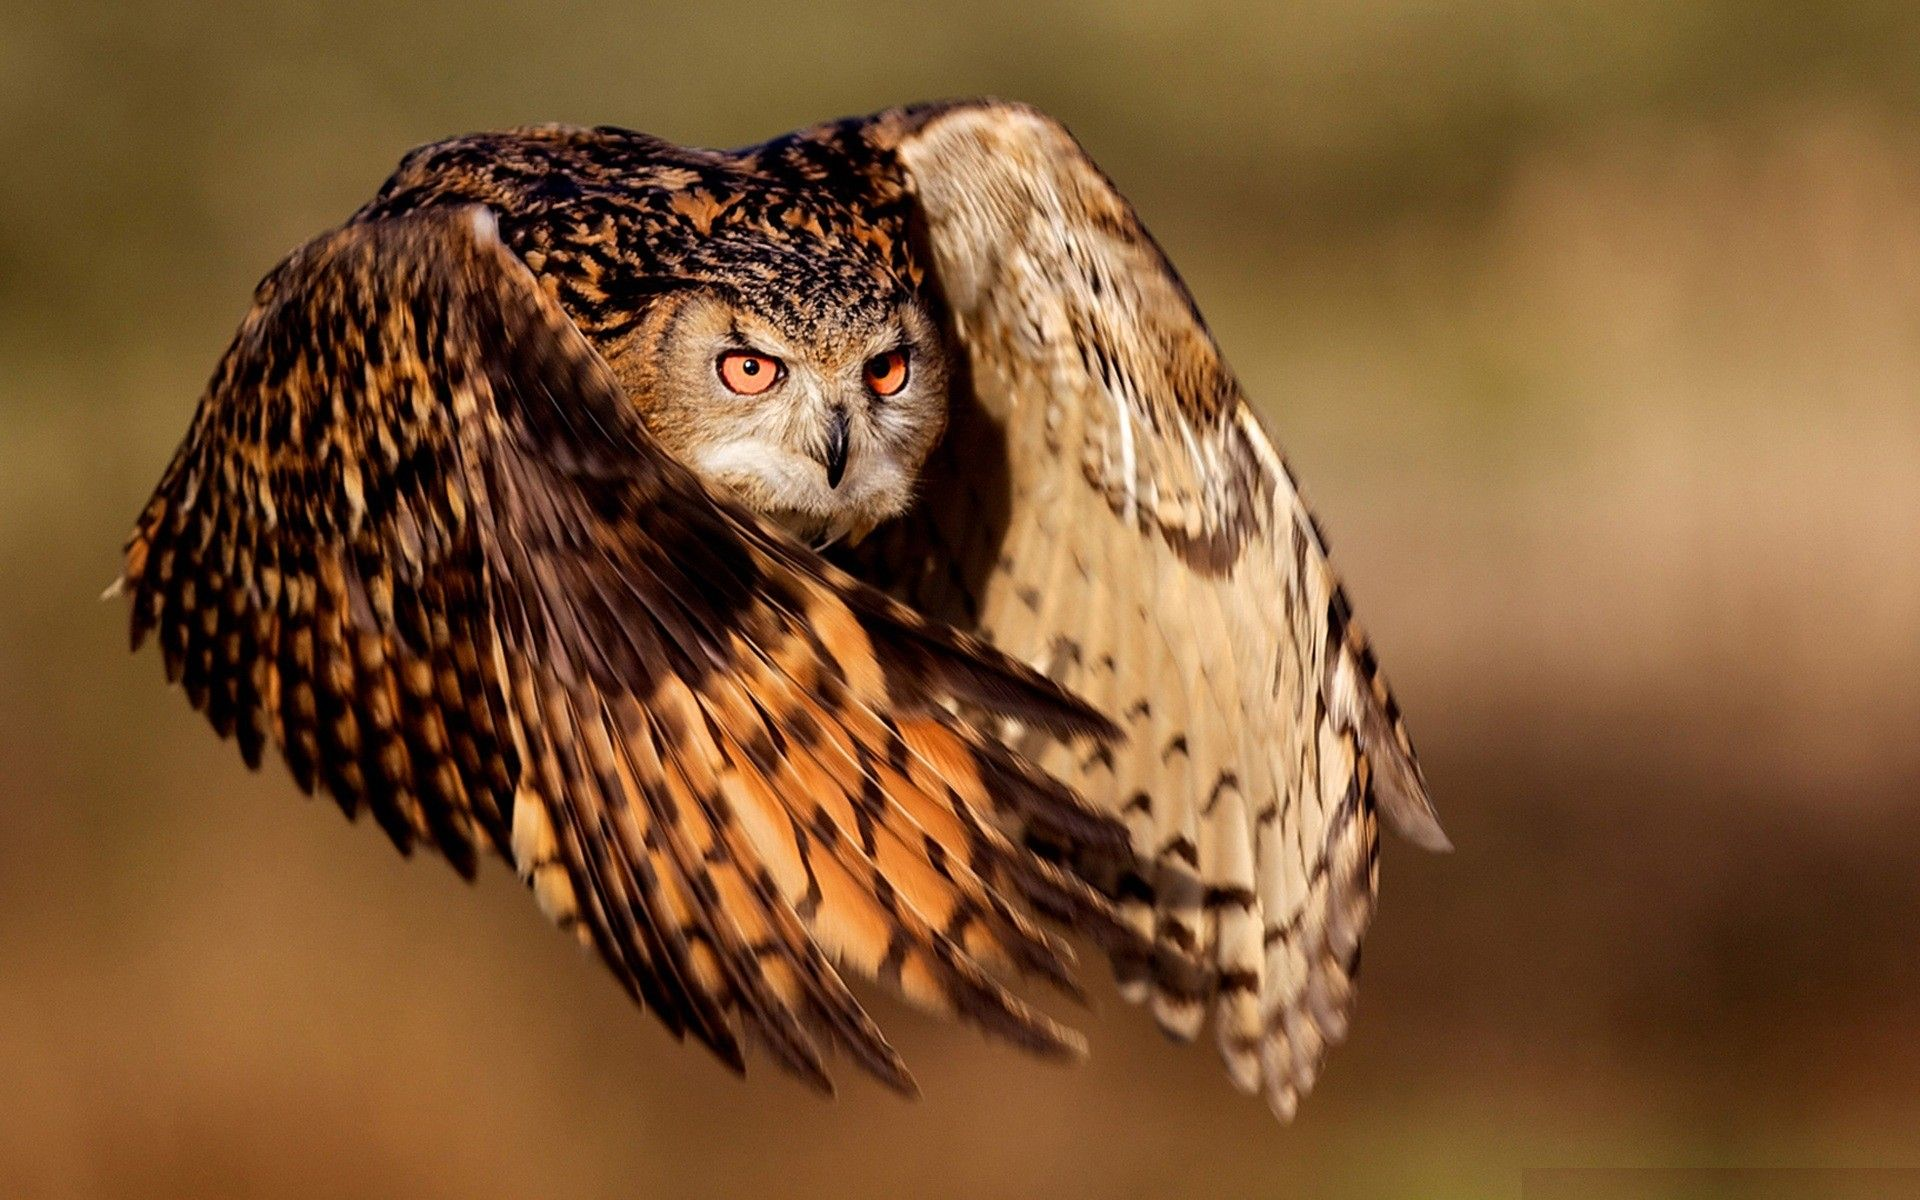 Bird Owl Wings wallpaper